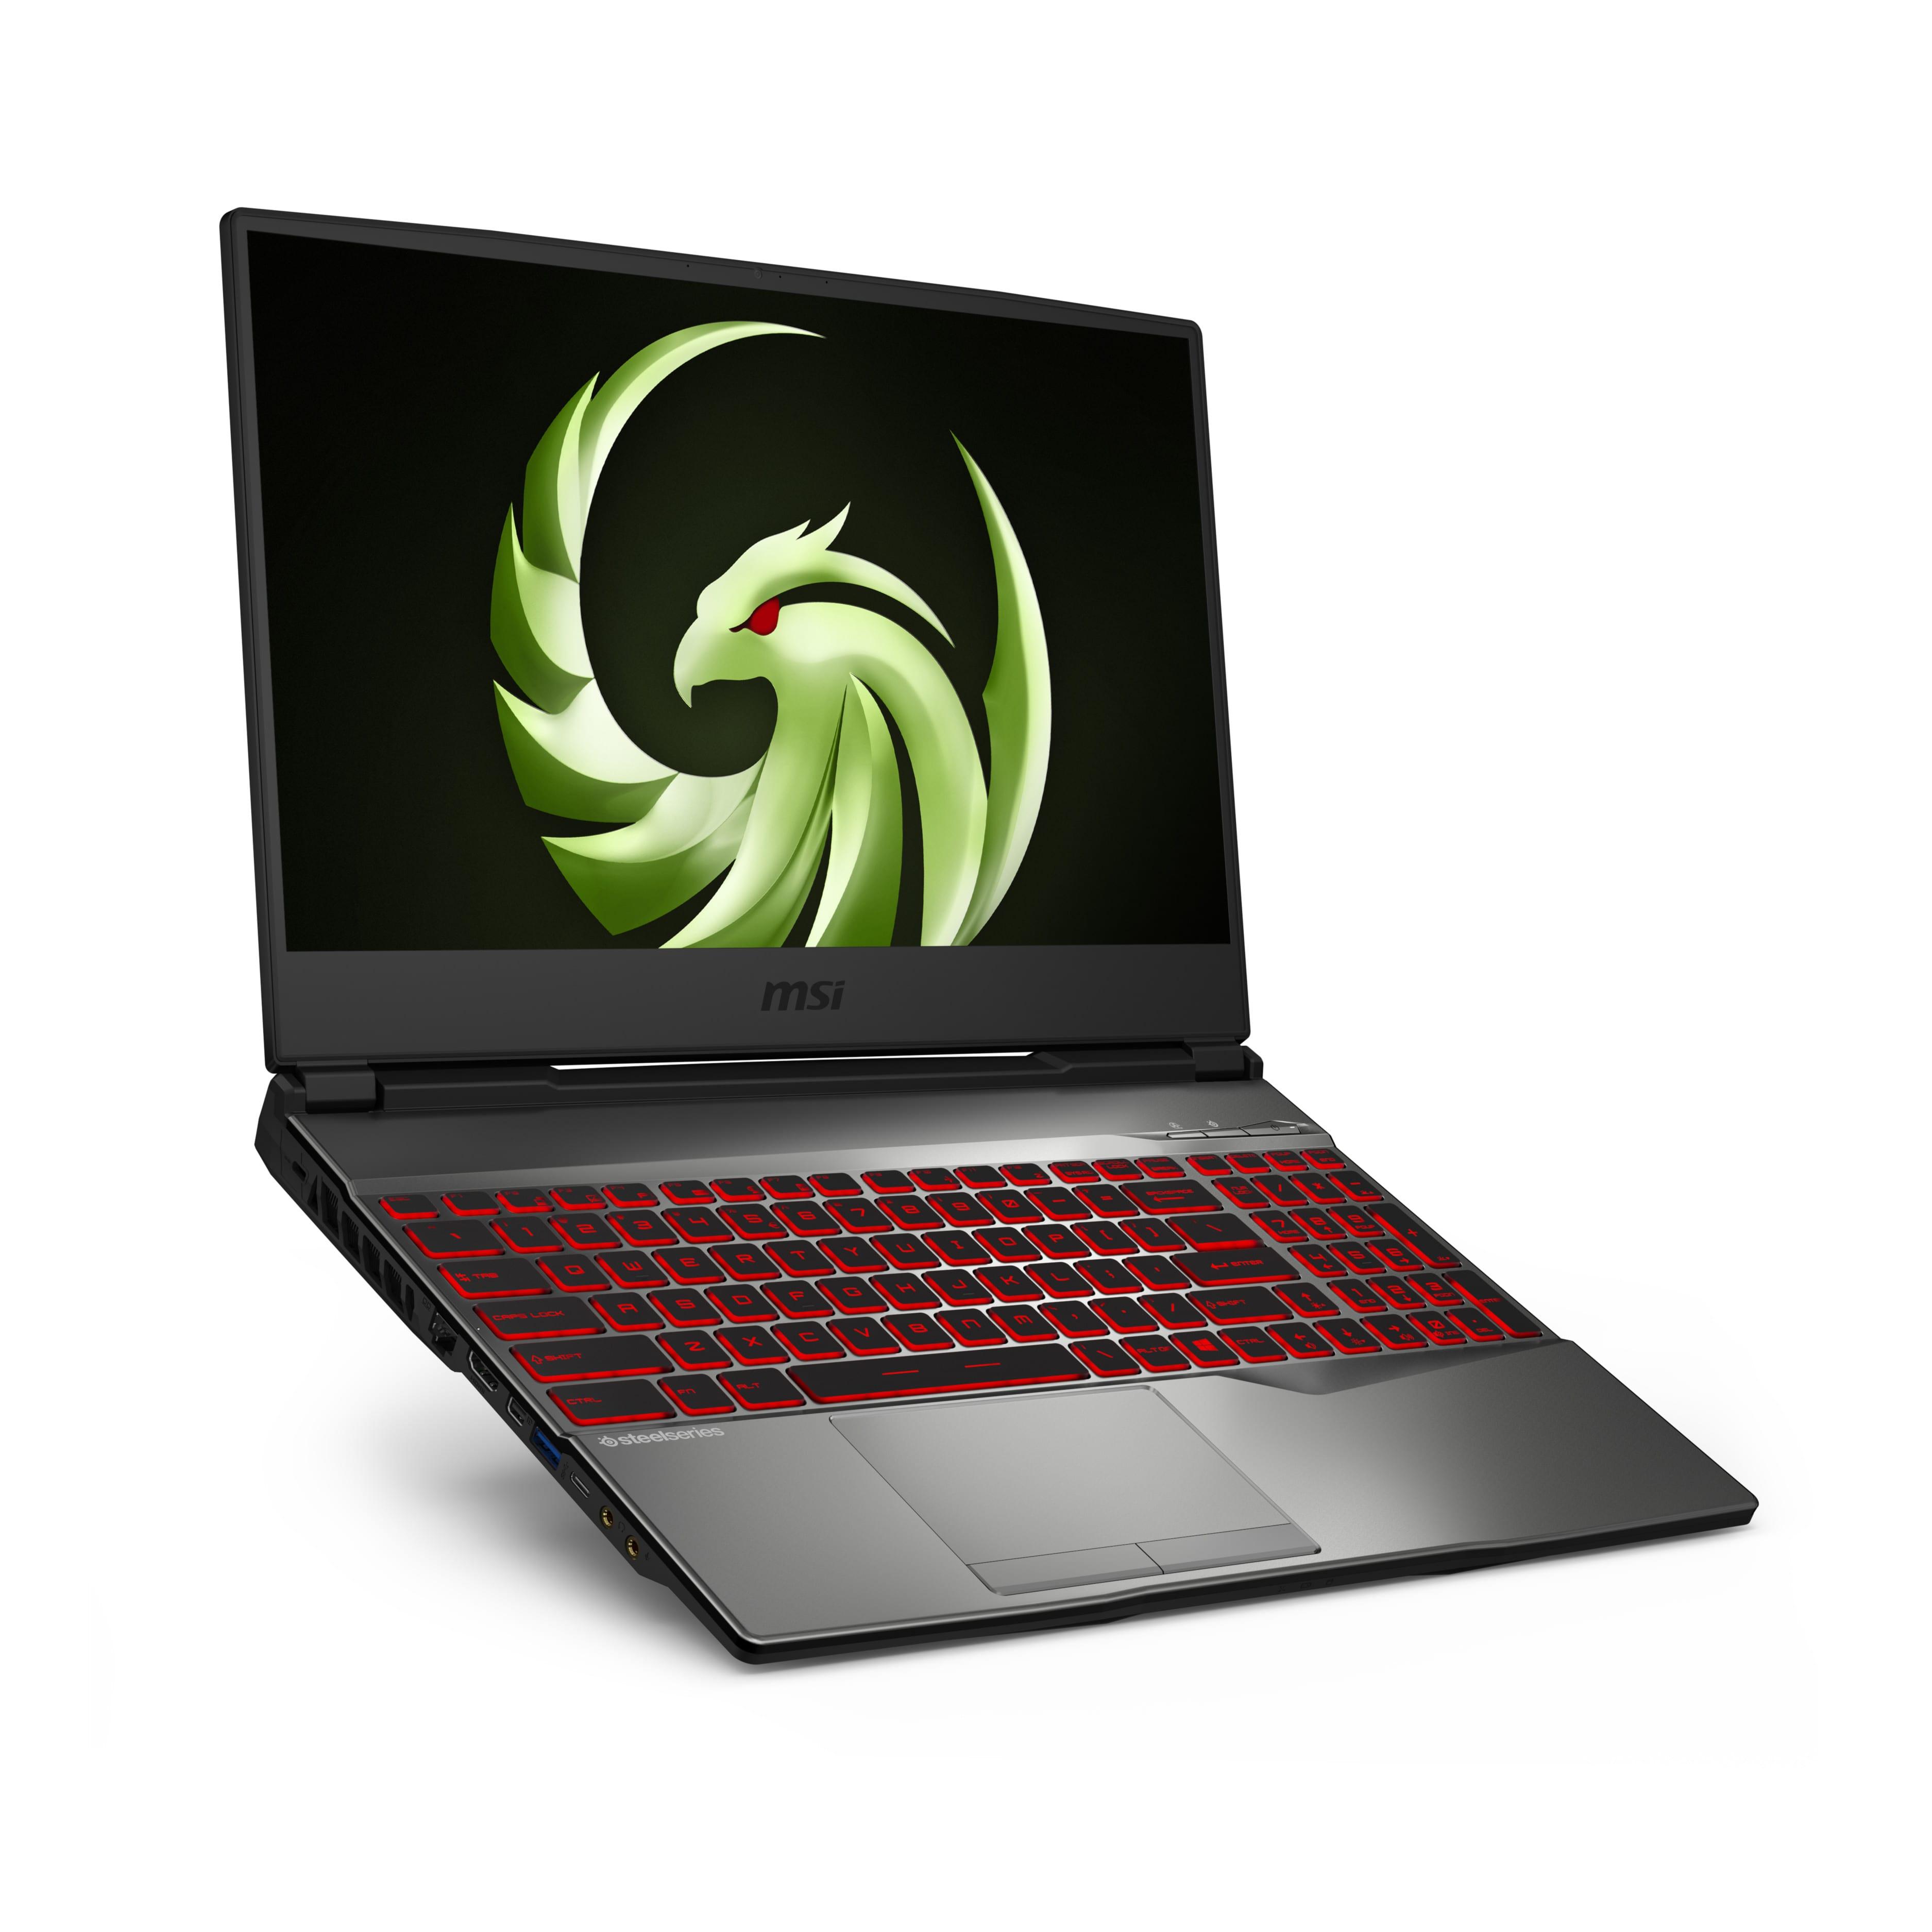 , Arrivano i laptop MSI serie Alpha con GPU Radeon a 7nm